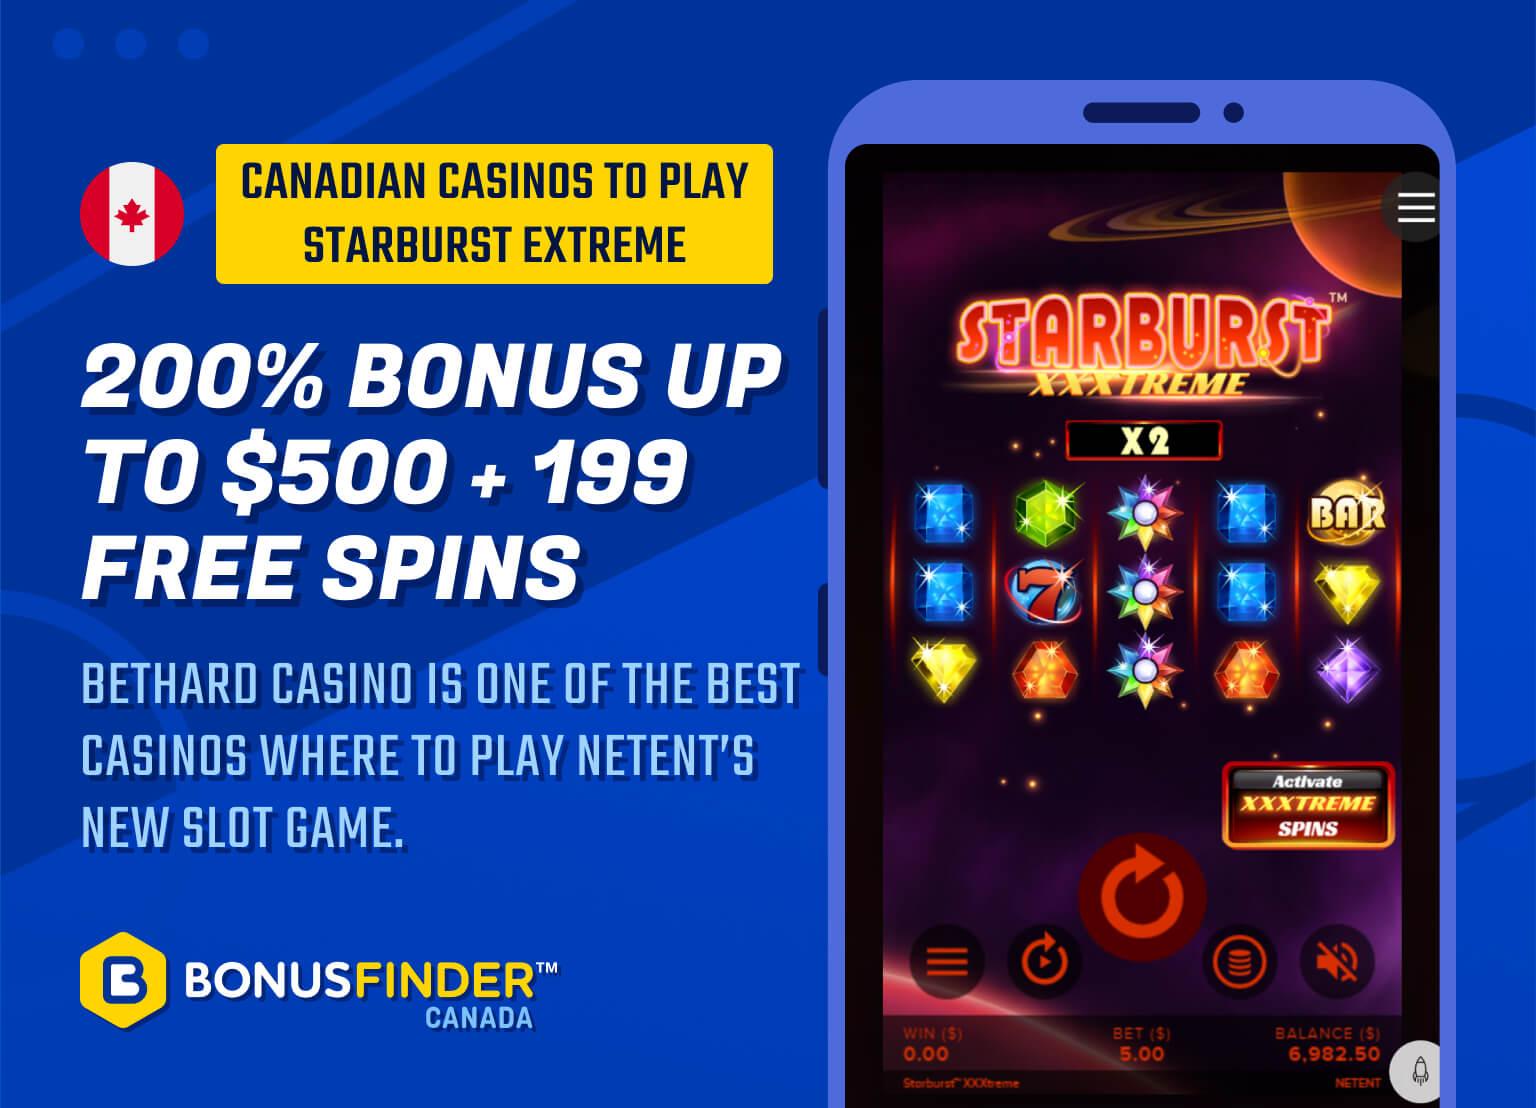 Starburst Extreme casino